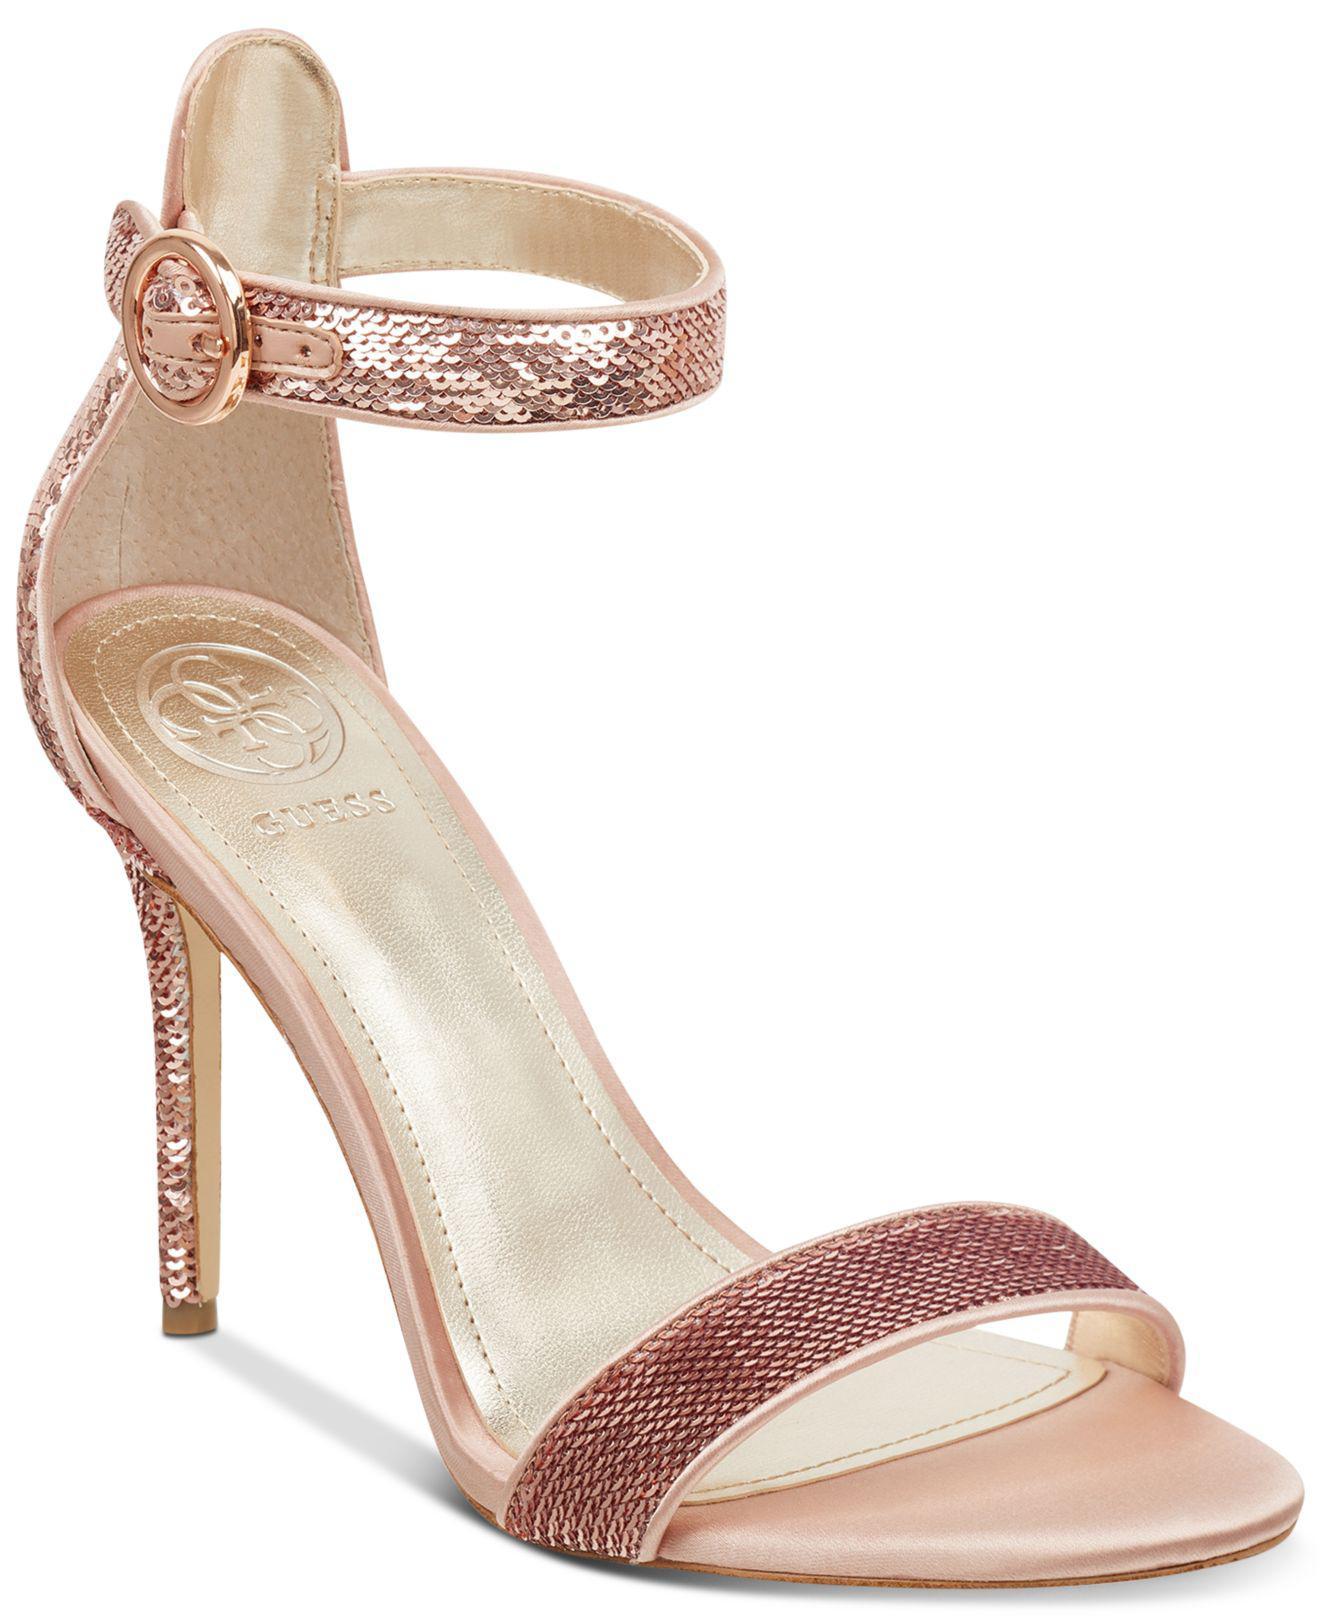 5eedeaa6df5 Lyst - Guess Kahluan Dress Sandals in Metallic